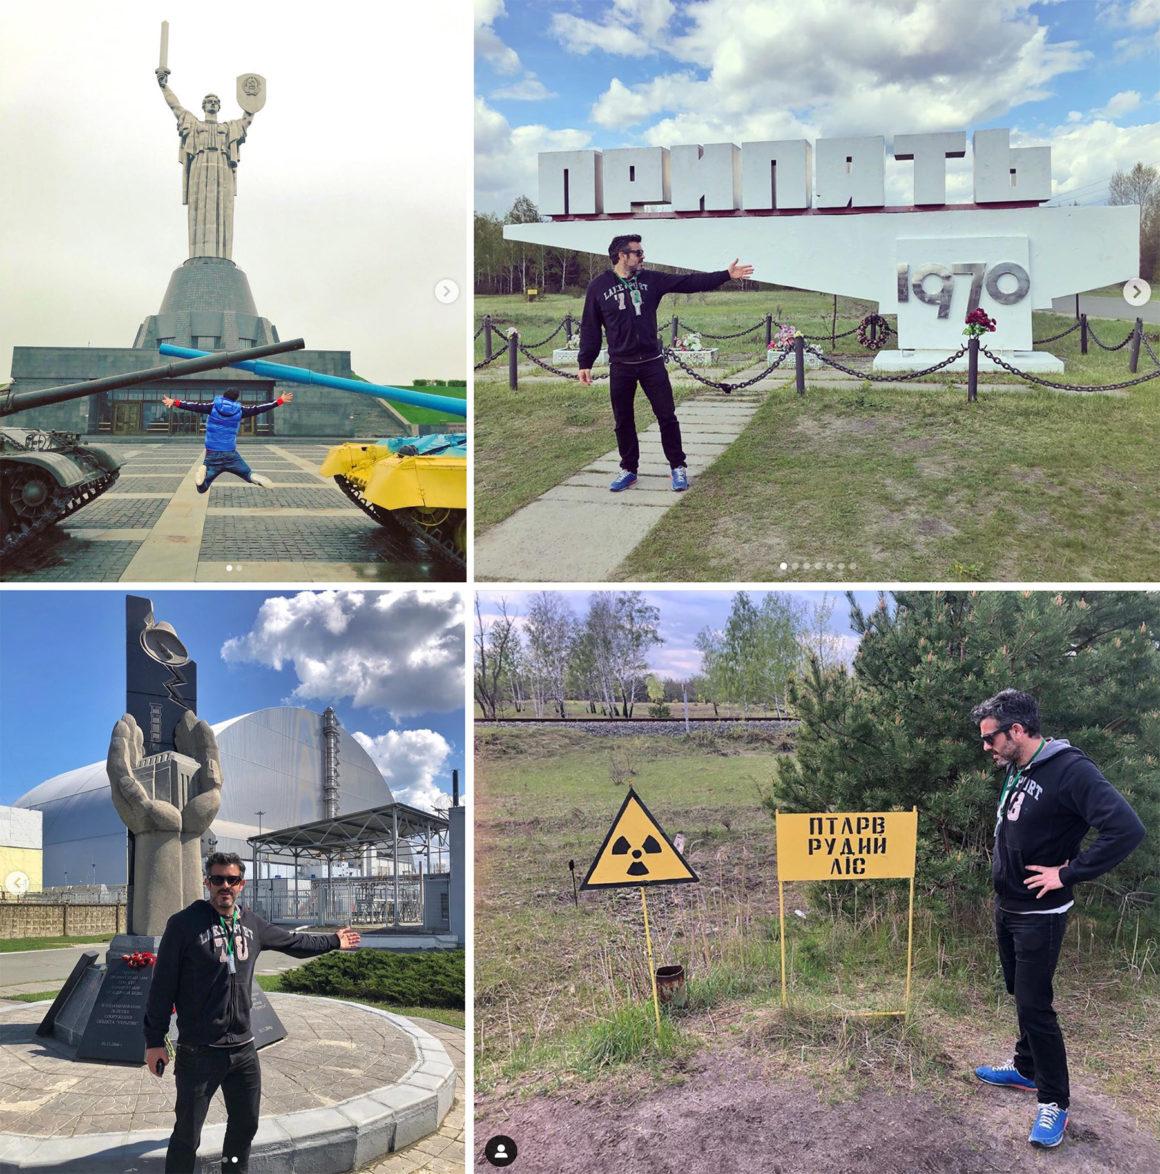 - 2019 Viajar a Ucrania 1160x1174 - Memoria de Viajes 2019 : Un nuevo viajero a la familia